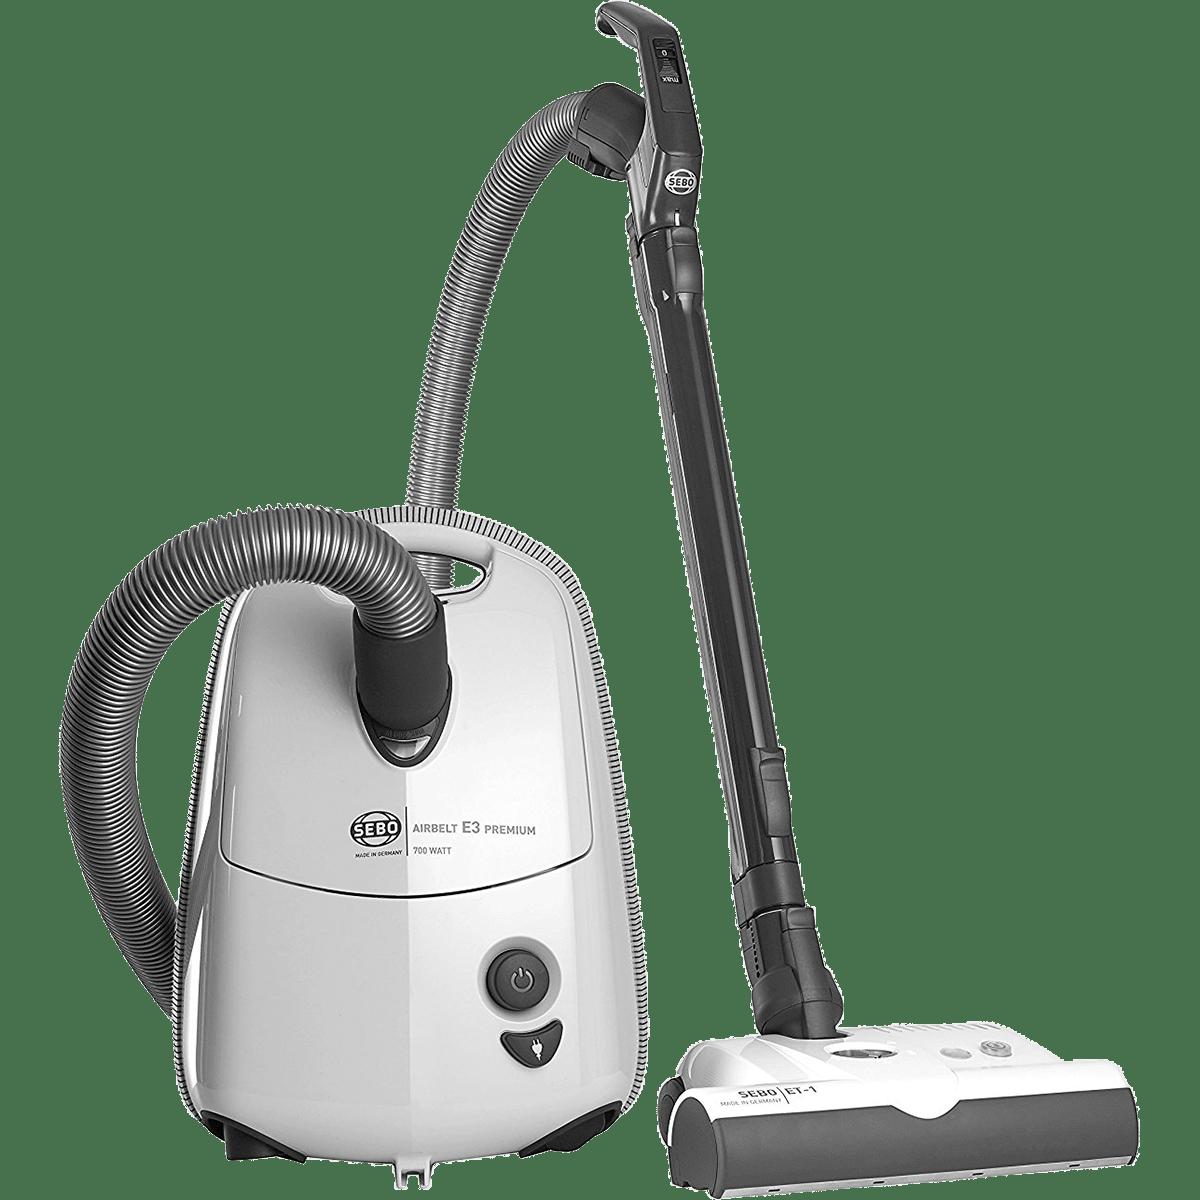 sebo airbelt e3 premium canister vacuum arctic white - Canister Vacuums